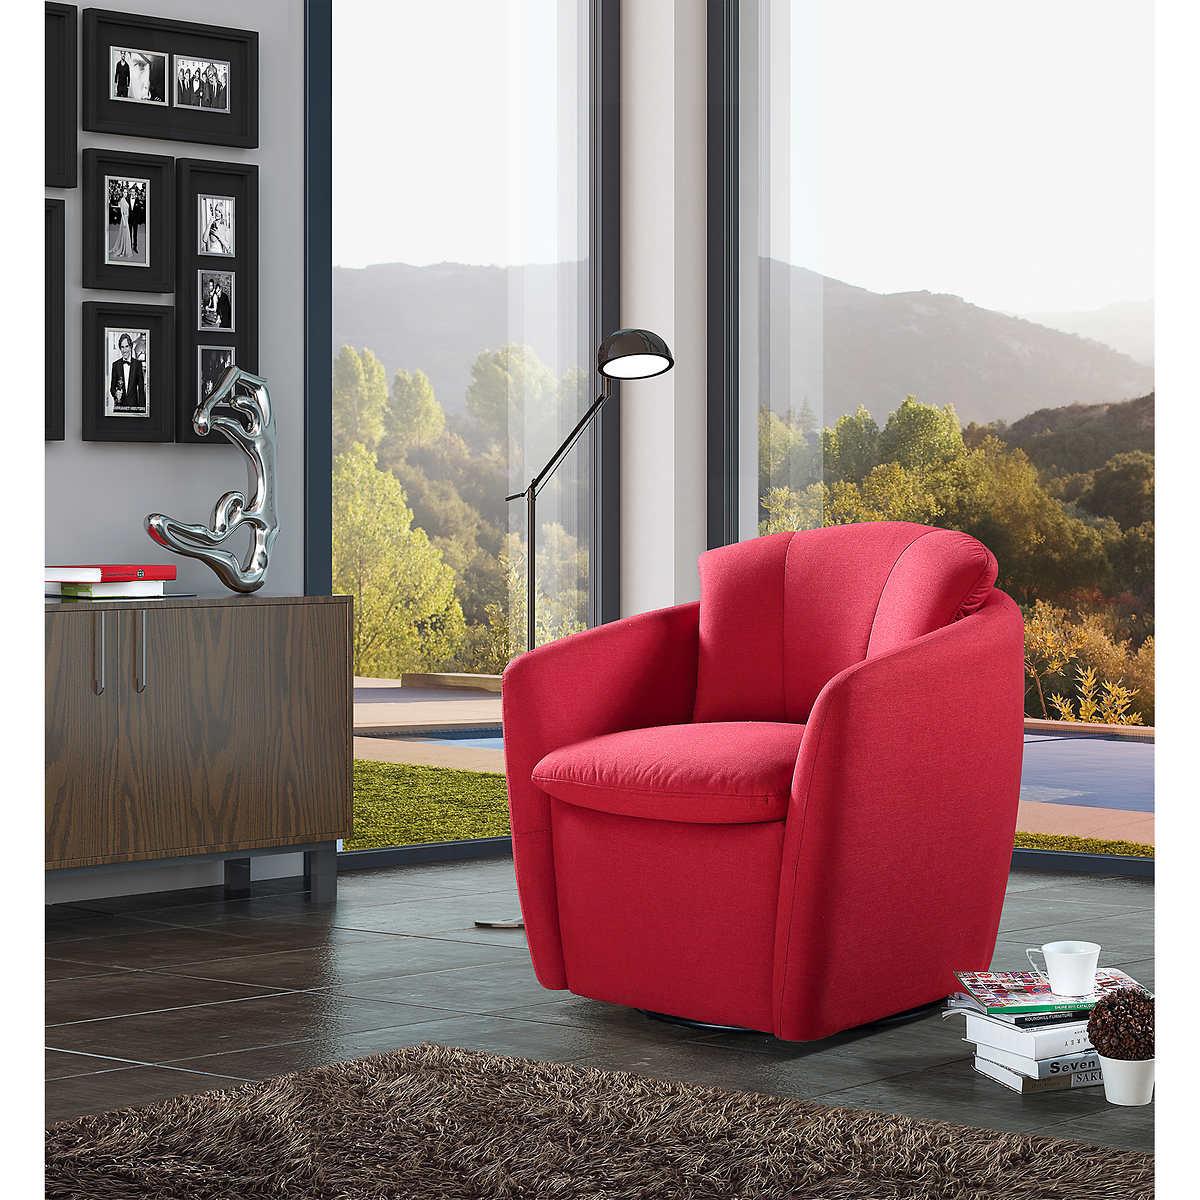 Furniture swivel and tub chairs dori fabric swivel cuddle chair - Amalfi Red Swivel Chair